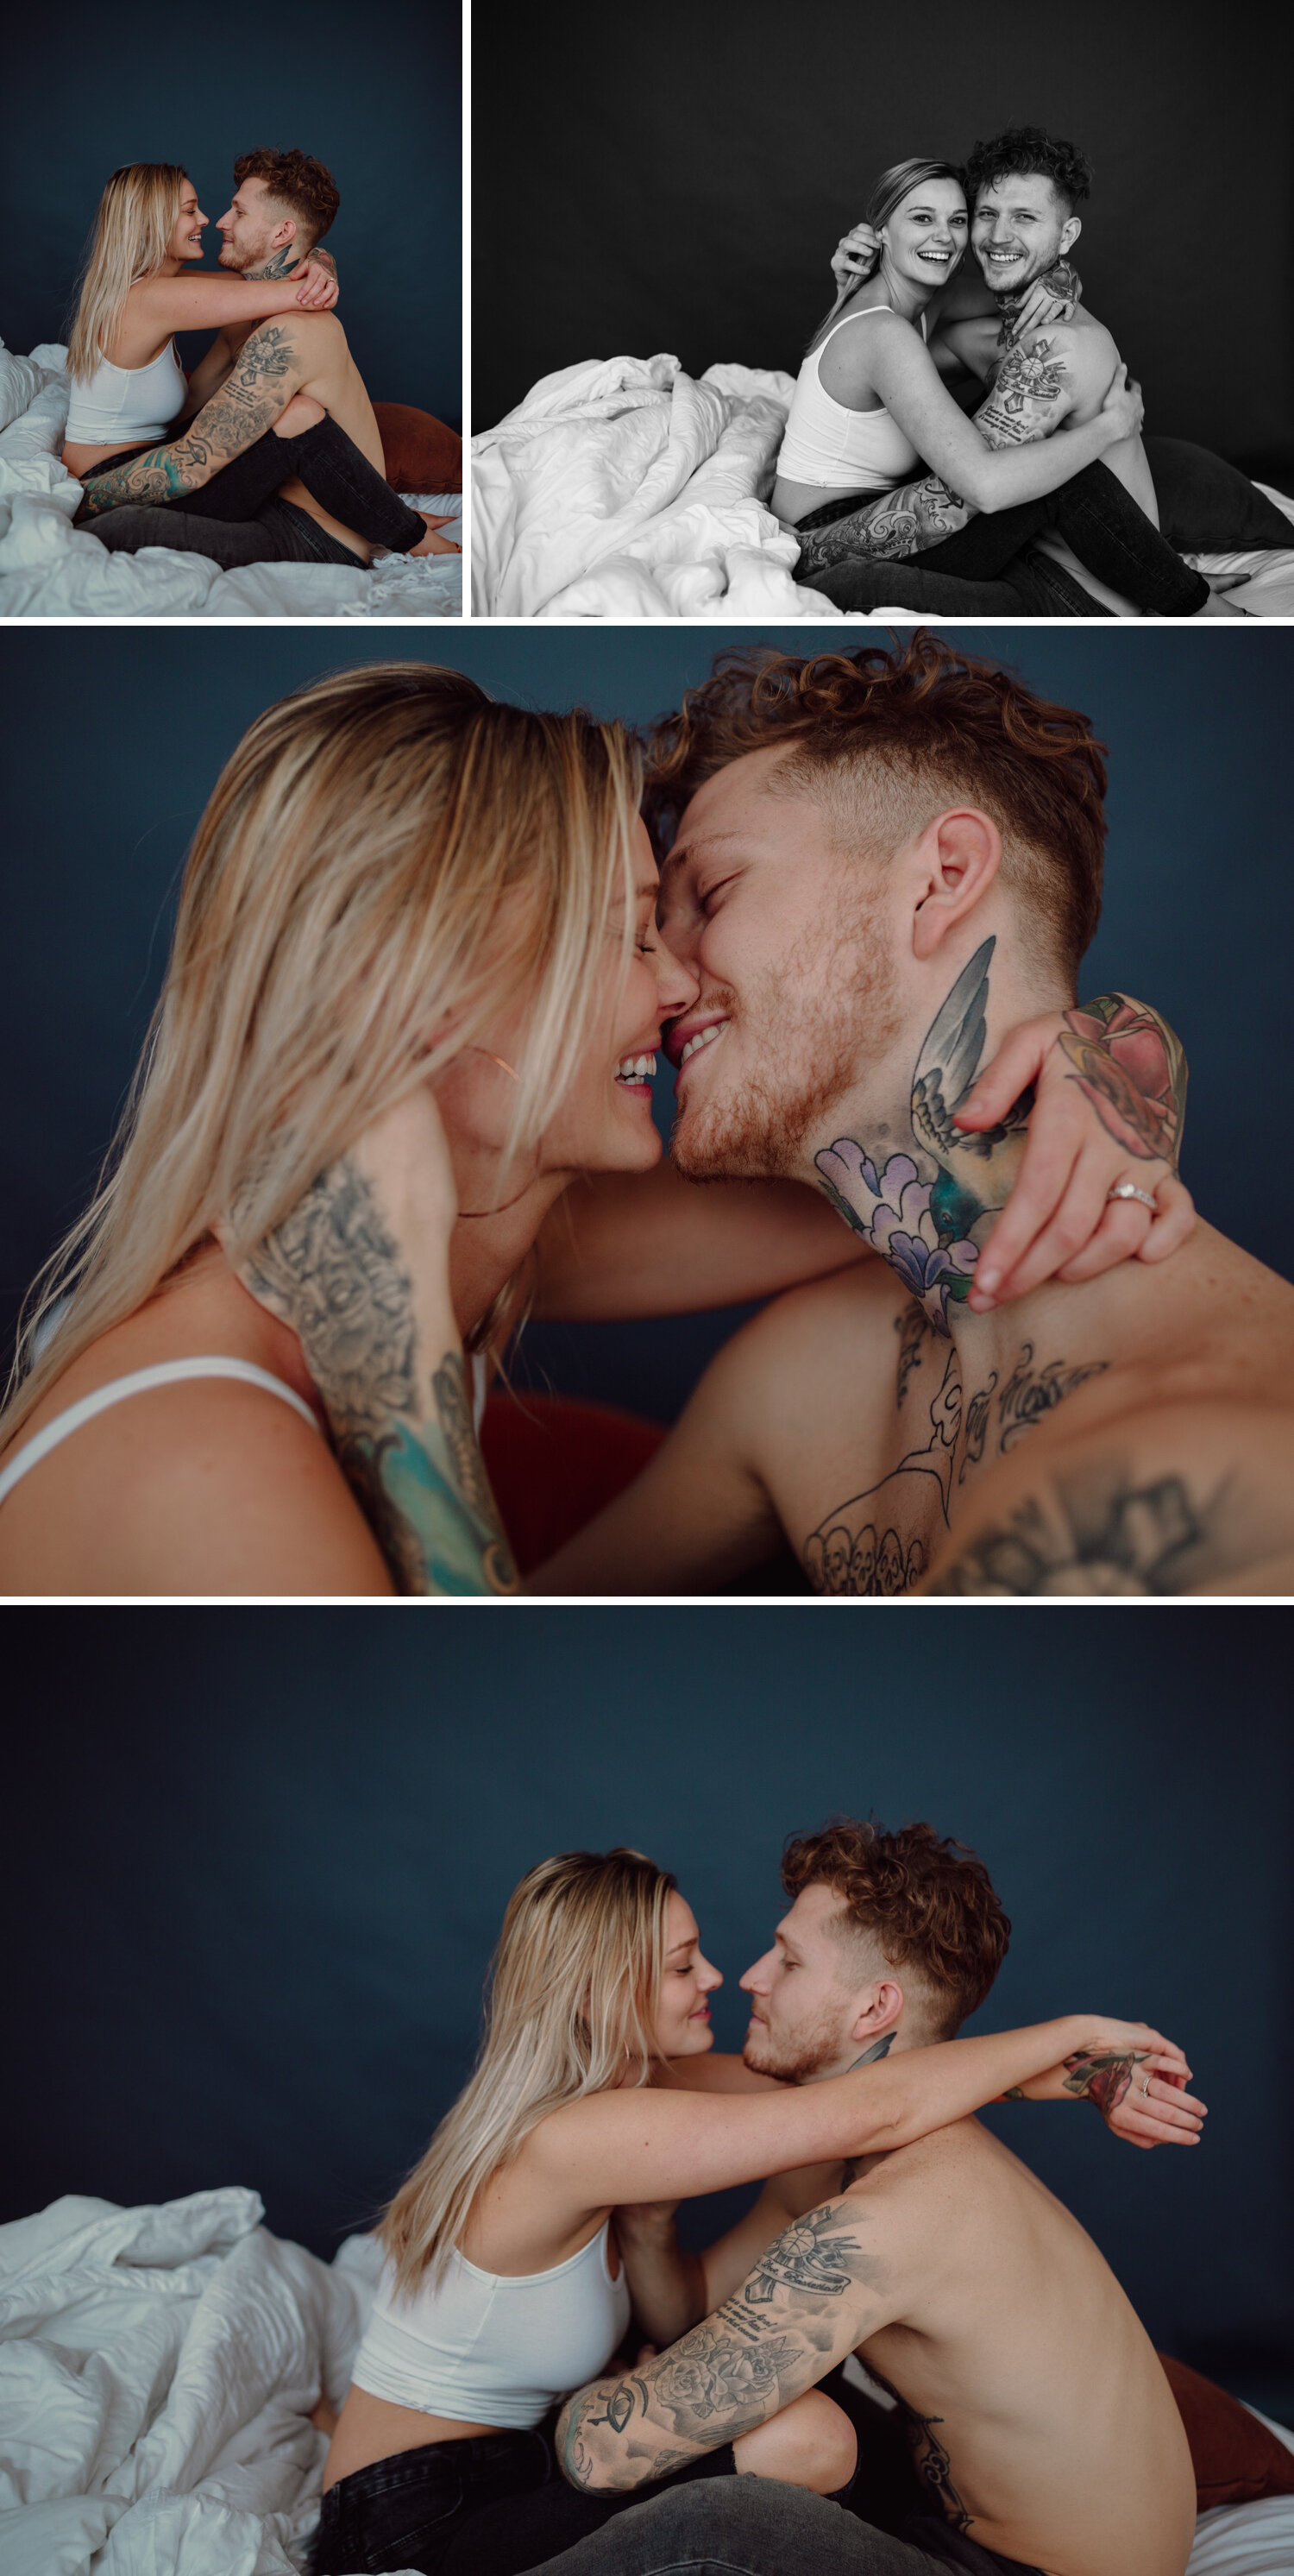 Intimate couple photos